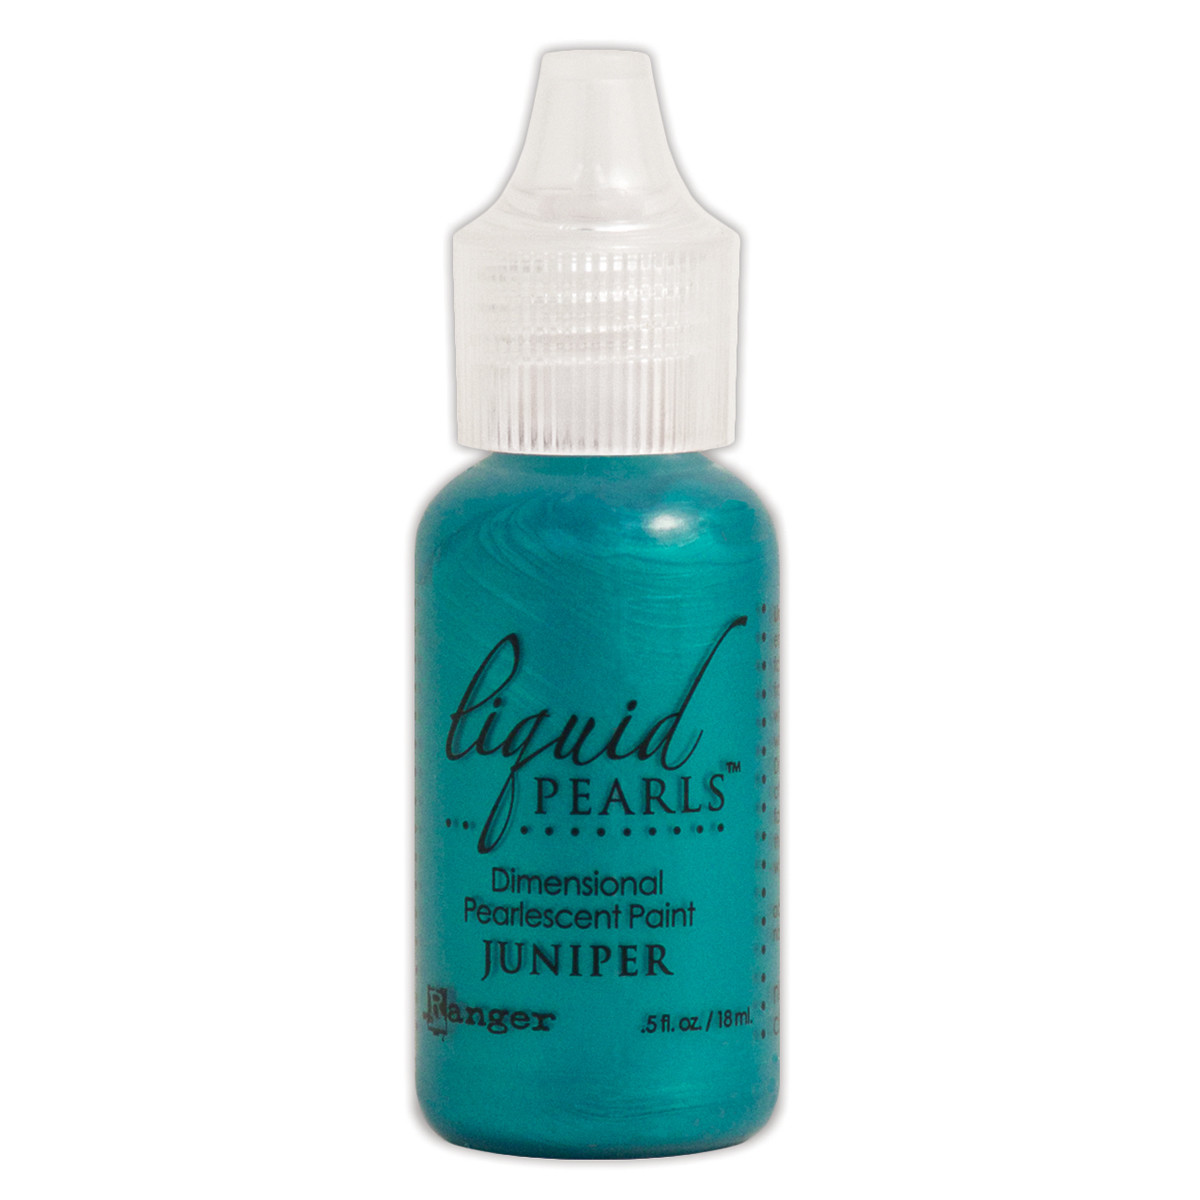 Ranger JUNIPER Liquid Pearls Dimensional Pearlescent Paint